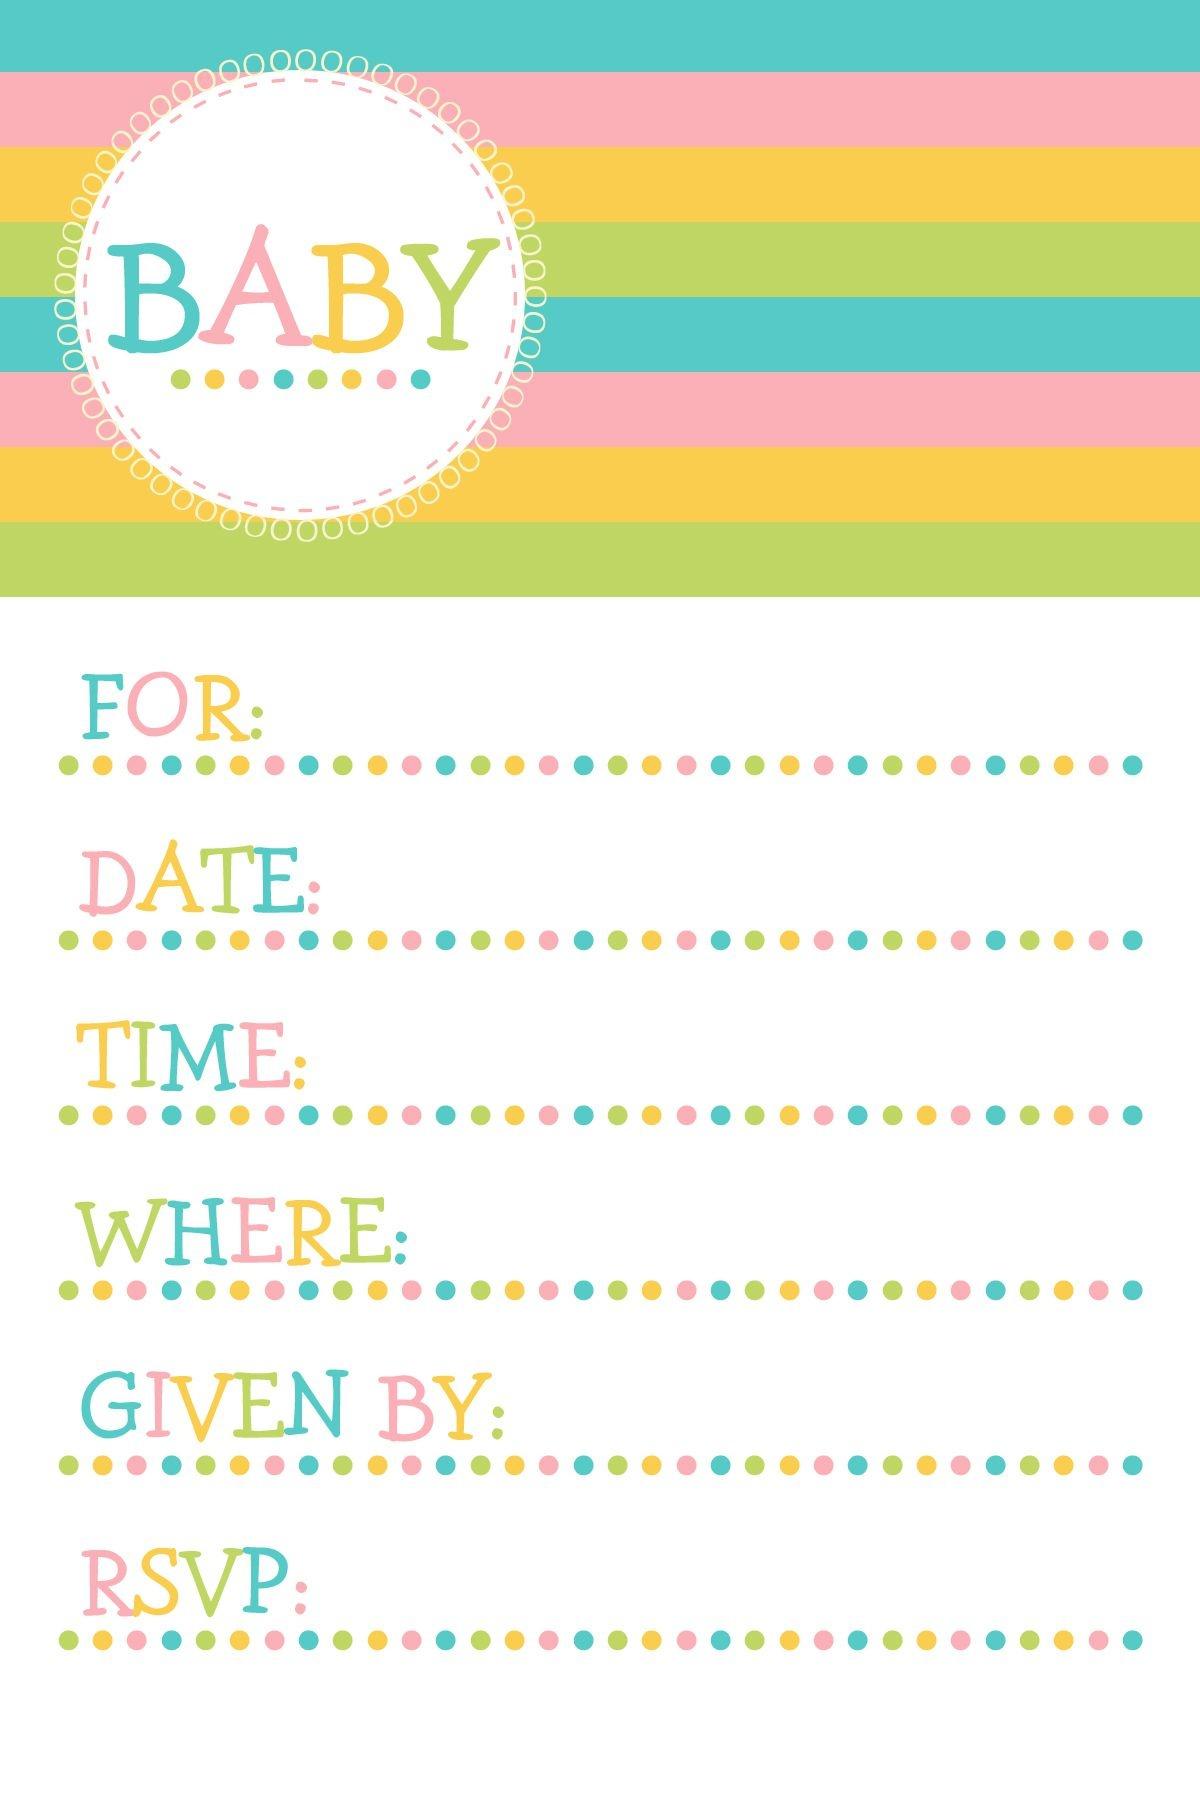 25 Adorable Free Printable Baby Shower Invitations - Free Printable Baby Shower Invitations